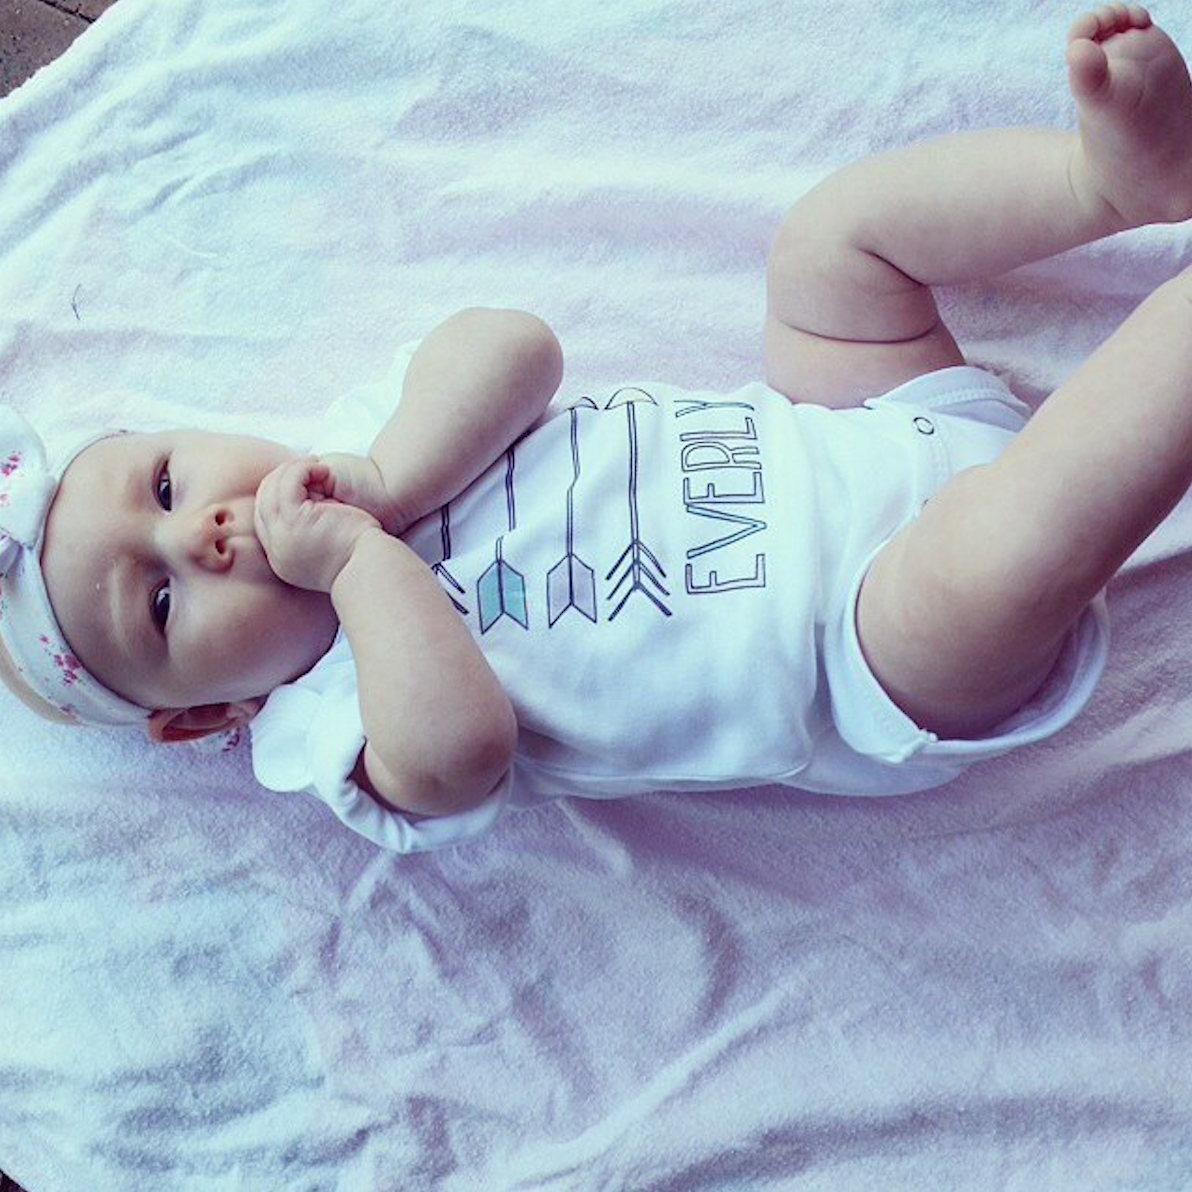 Everly in our Aztec Arrows Baby Name Onesie (customer photo via Instagram @wordonbaby)